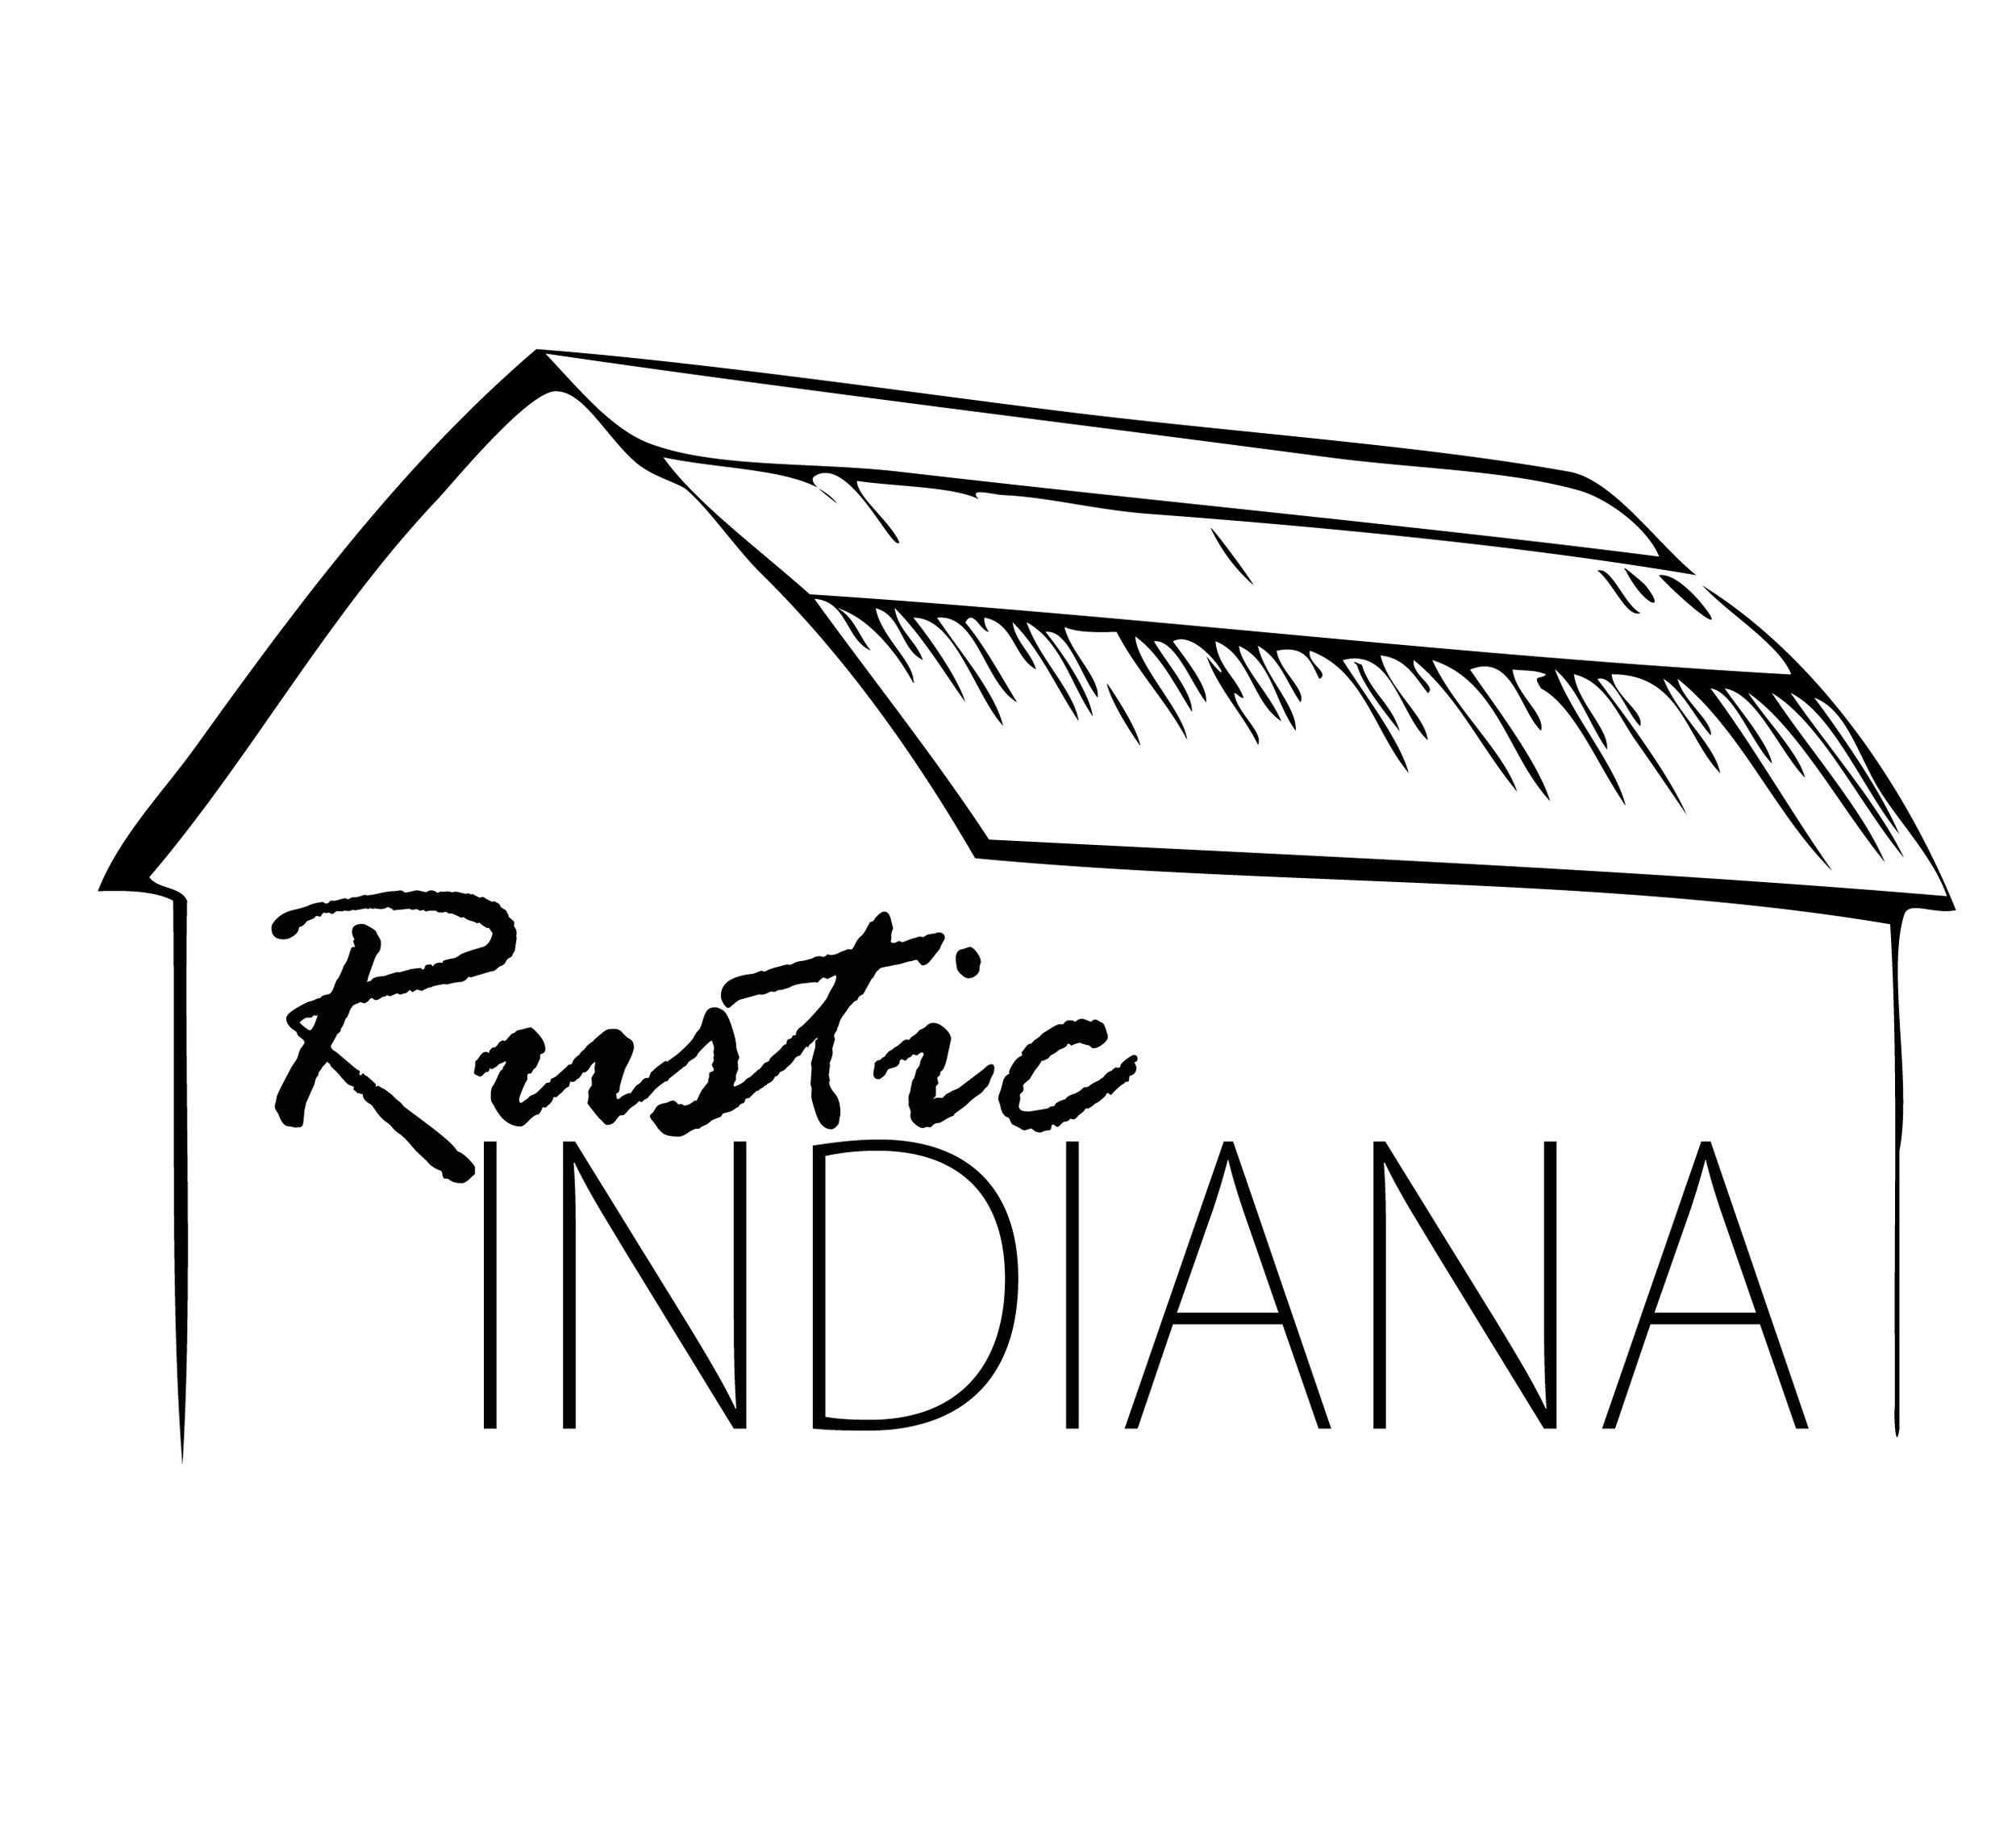 Rustic Indiana logo